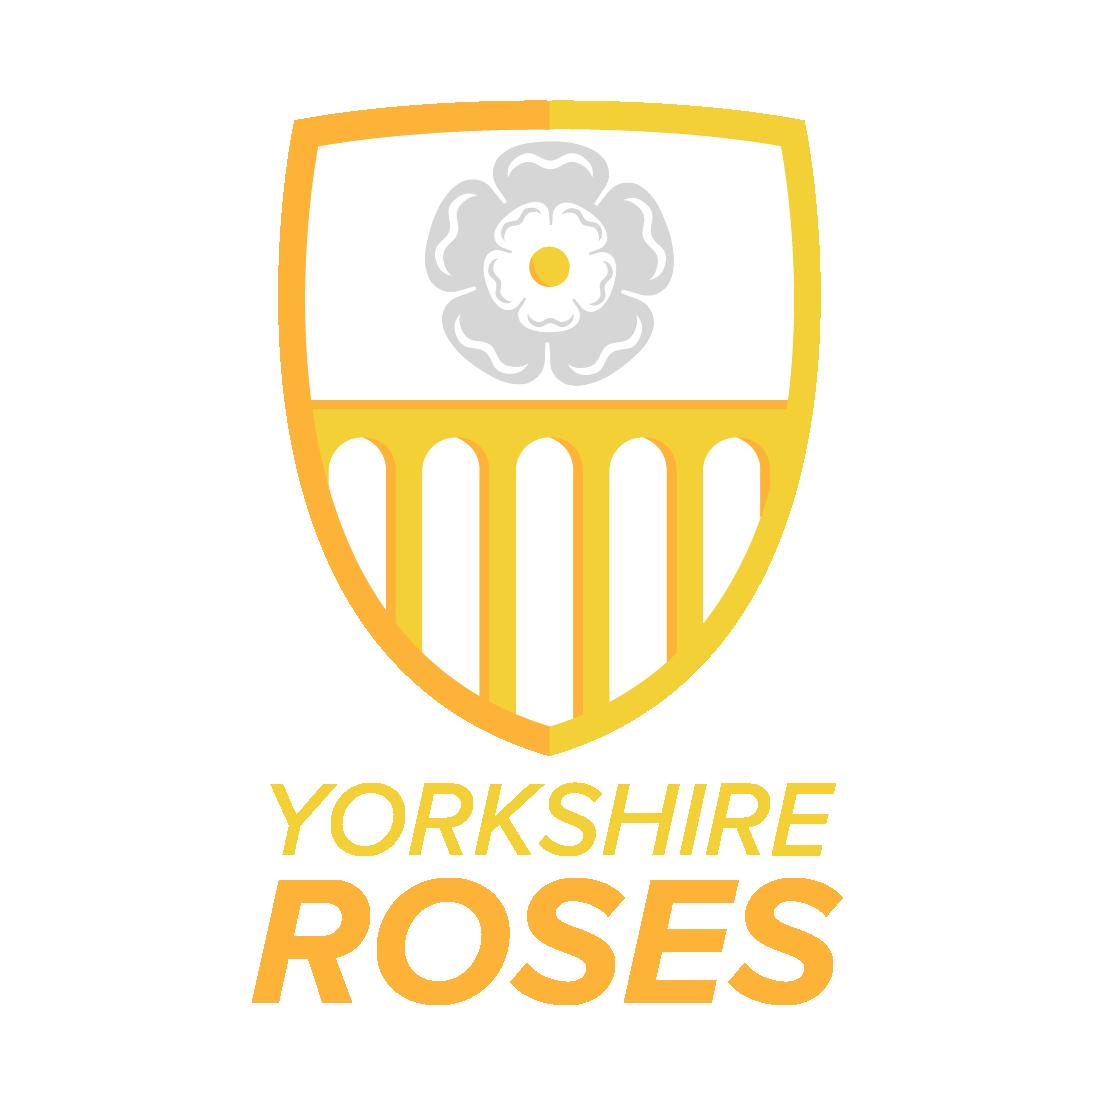 Yorkshire Roses